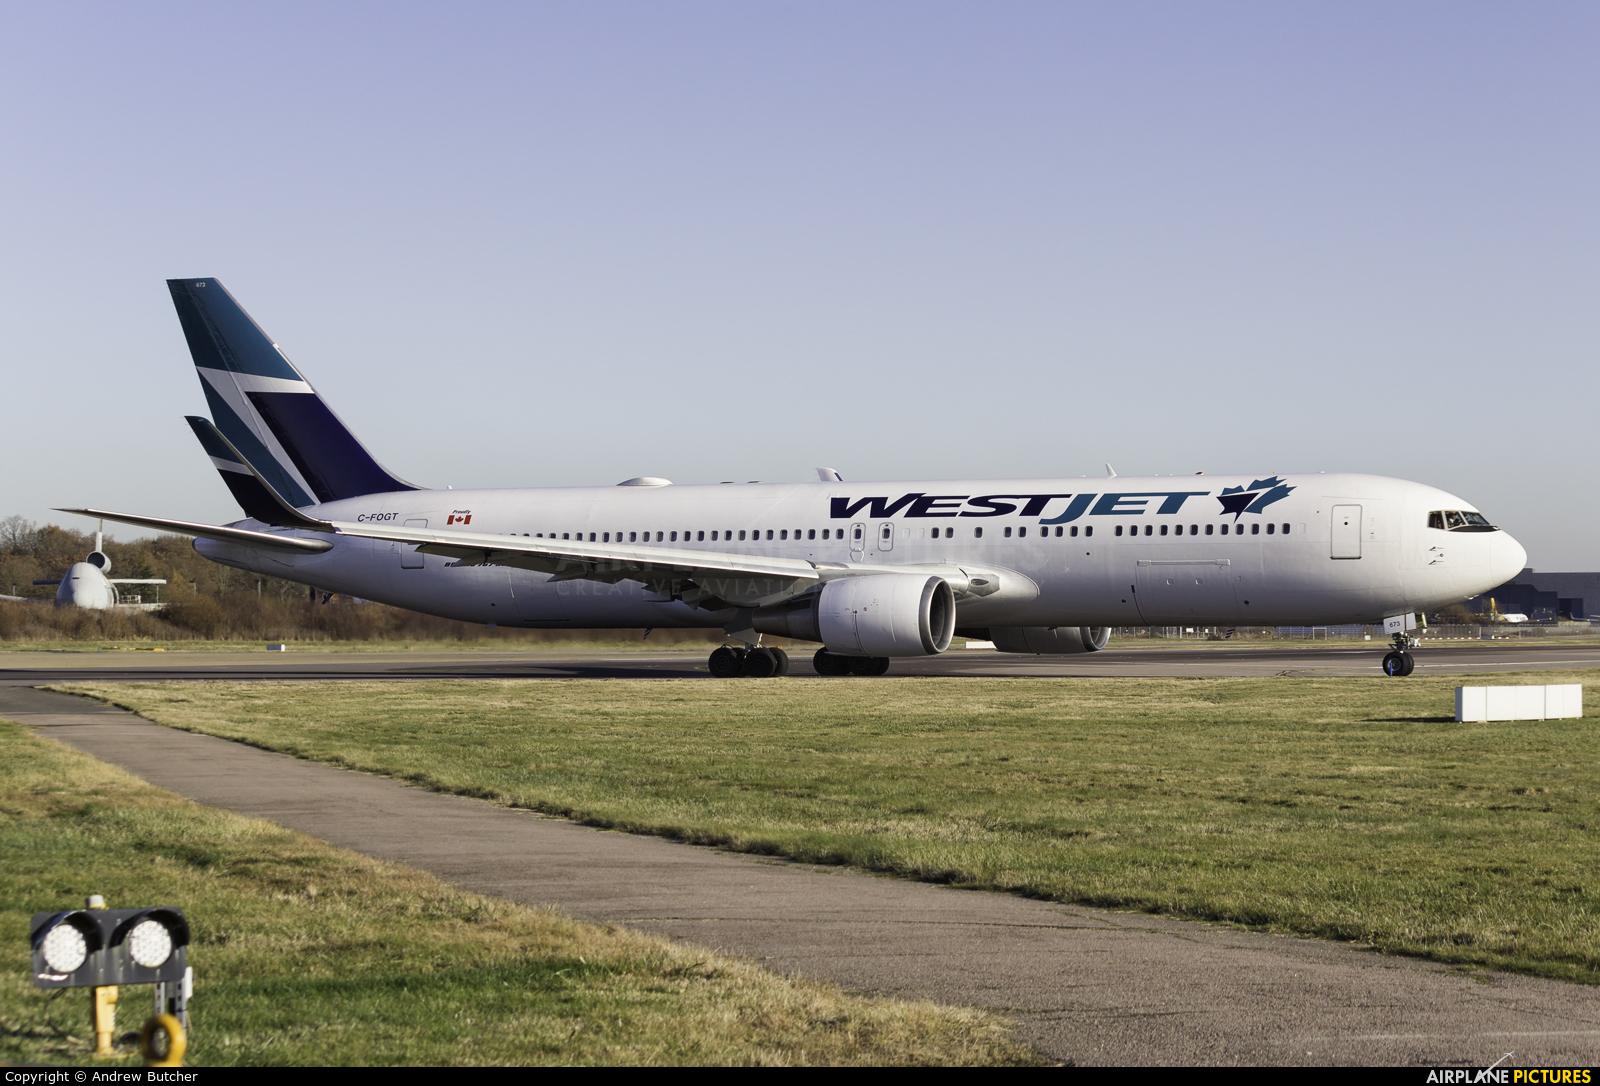 WestJet Airlines C-FOGT aircraft at London - Gatwick